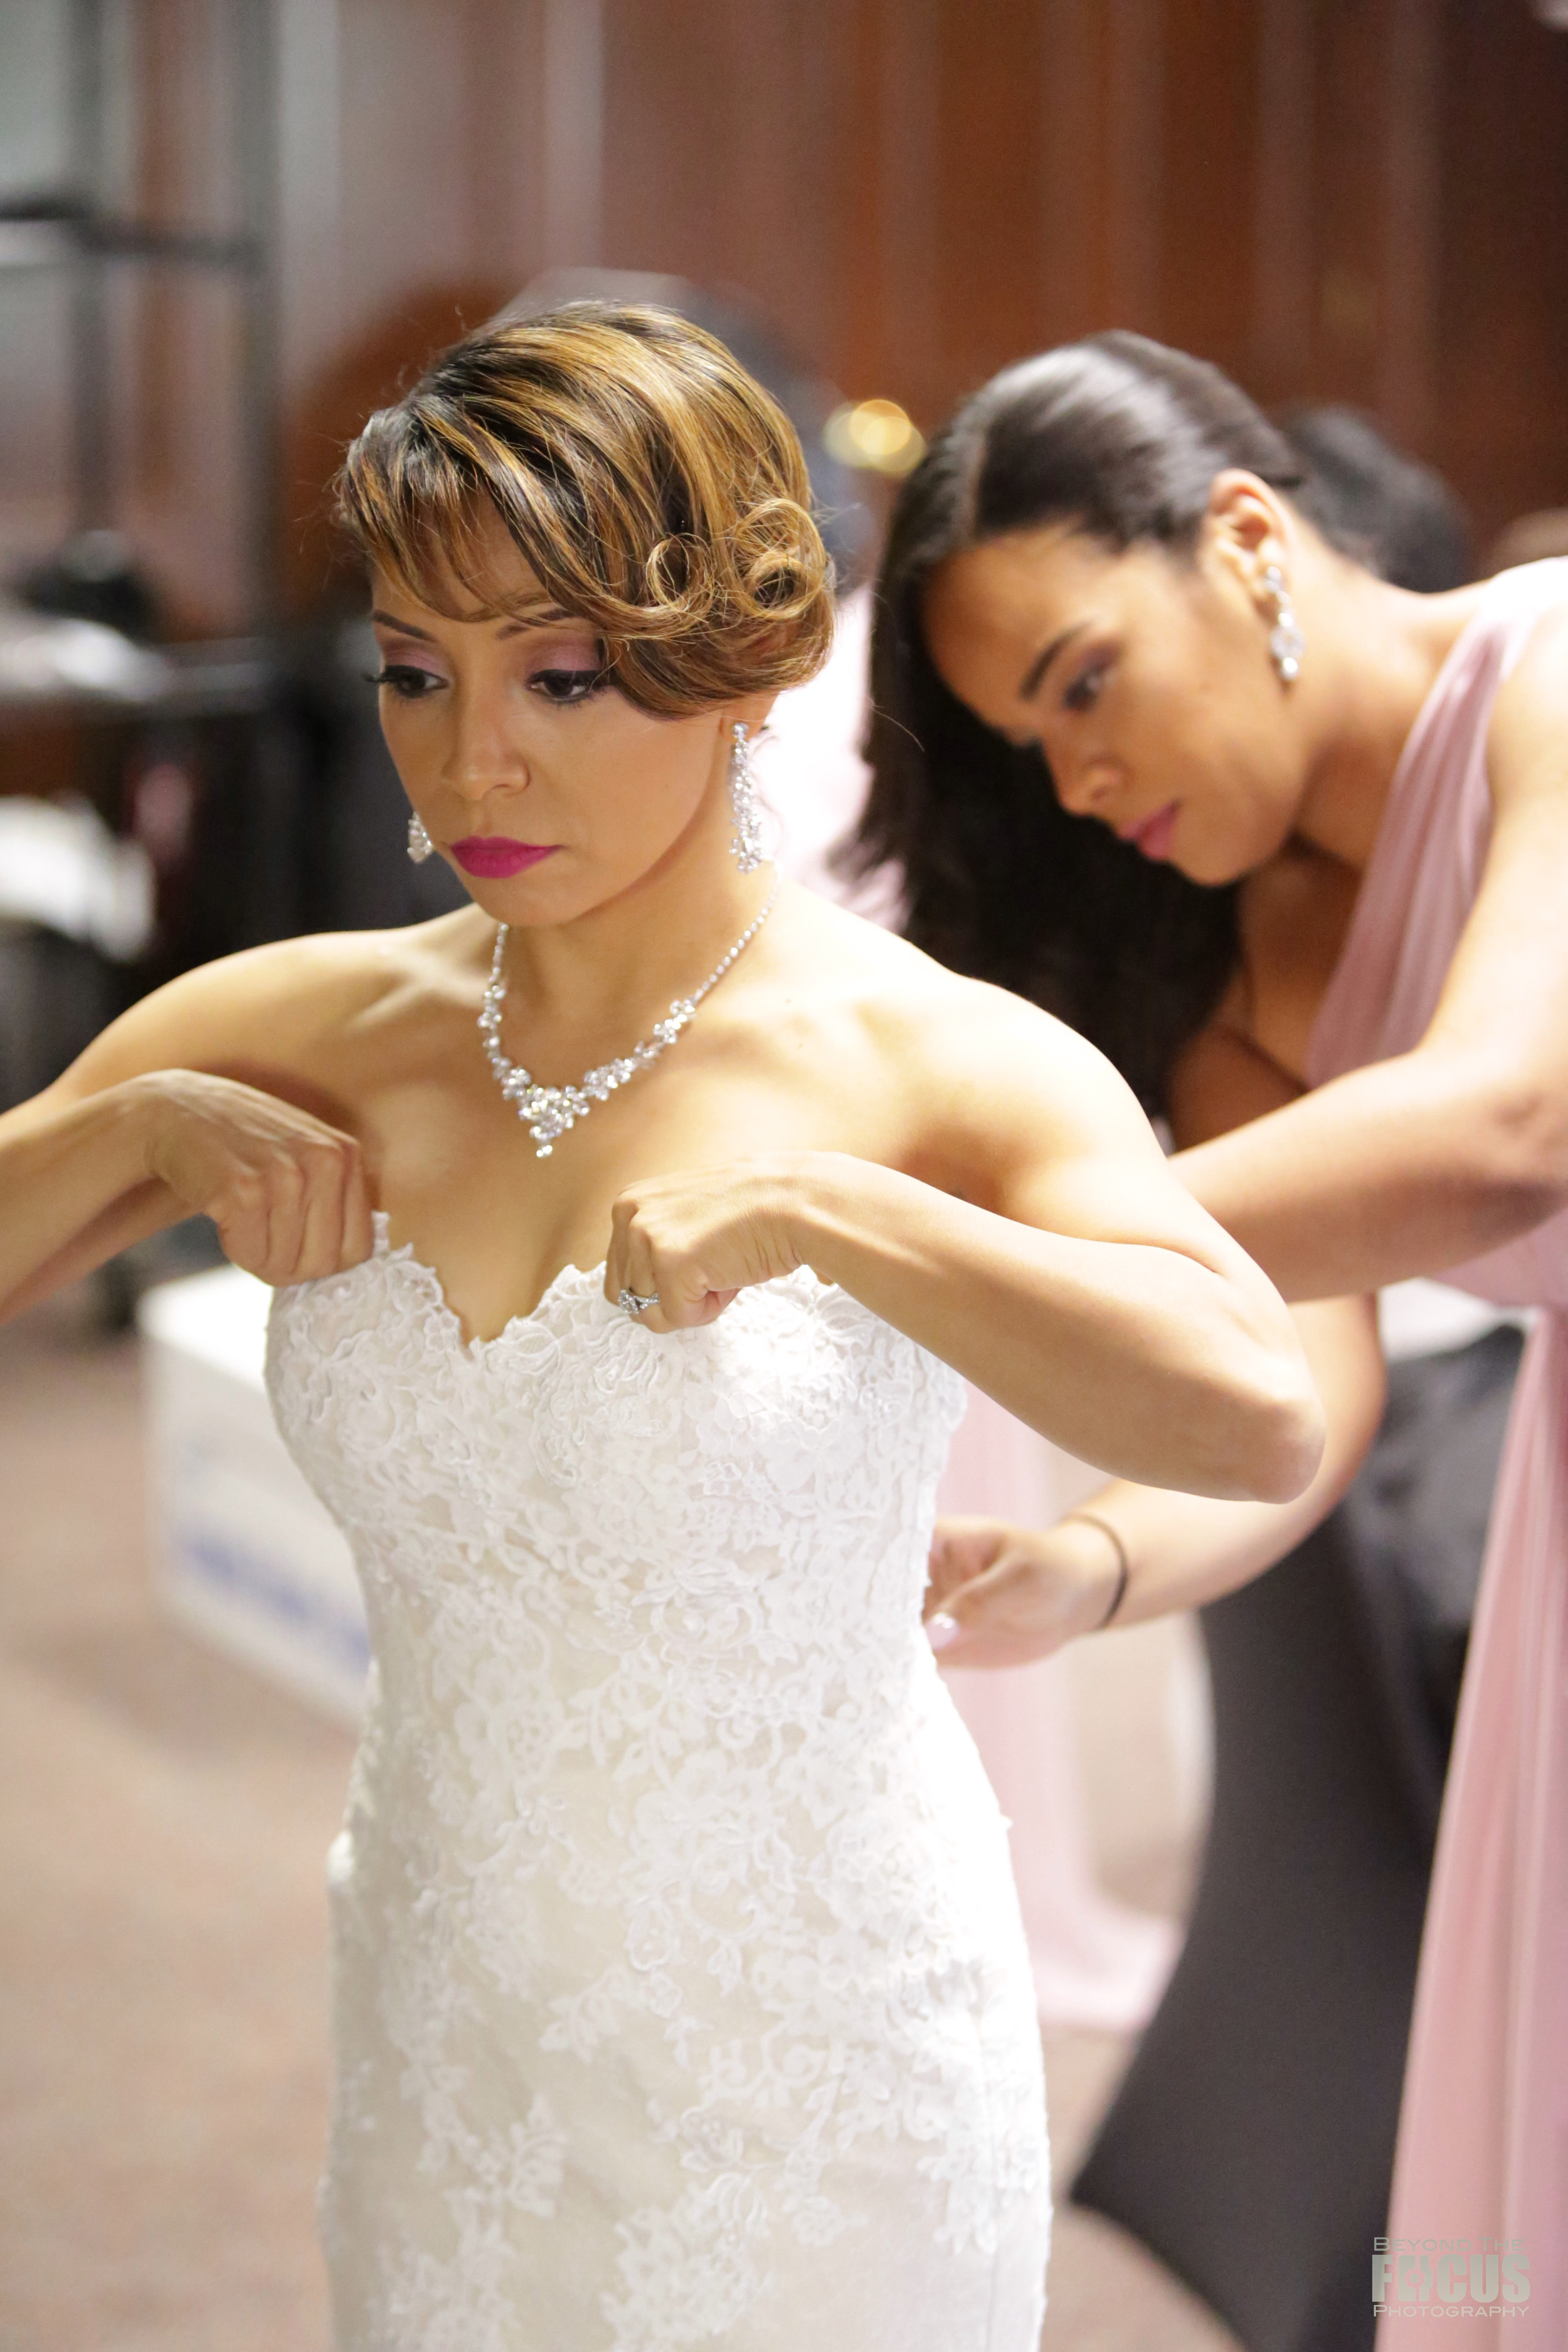 Palmer Wedding - Pre-Wedding Photos 16.jpg